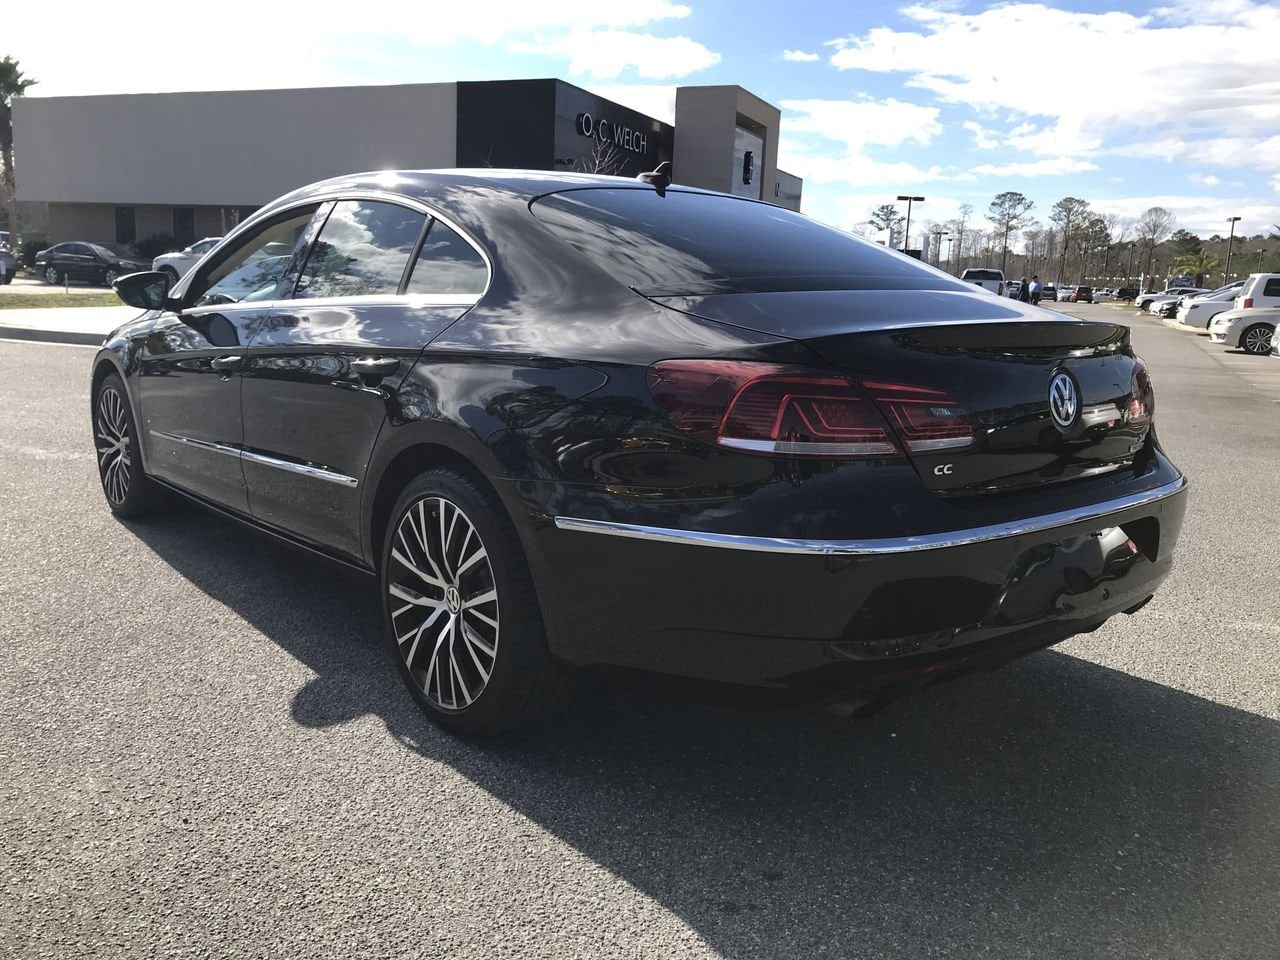 Used 2014 Volkswagen CC For Sale | Hardeeville SC | WVWGU7AN0EE527097